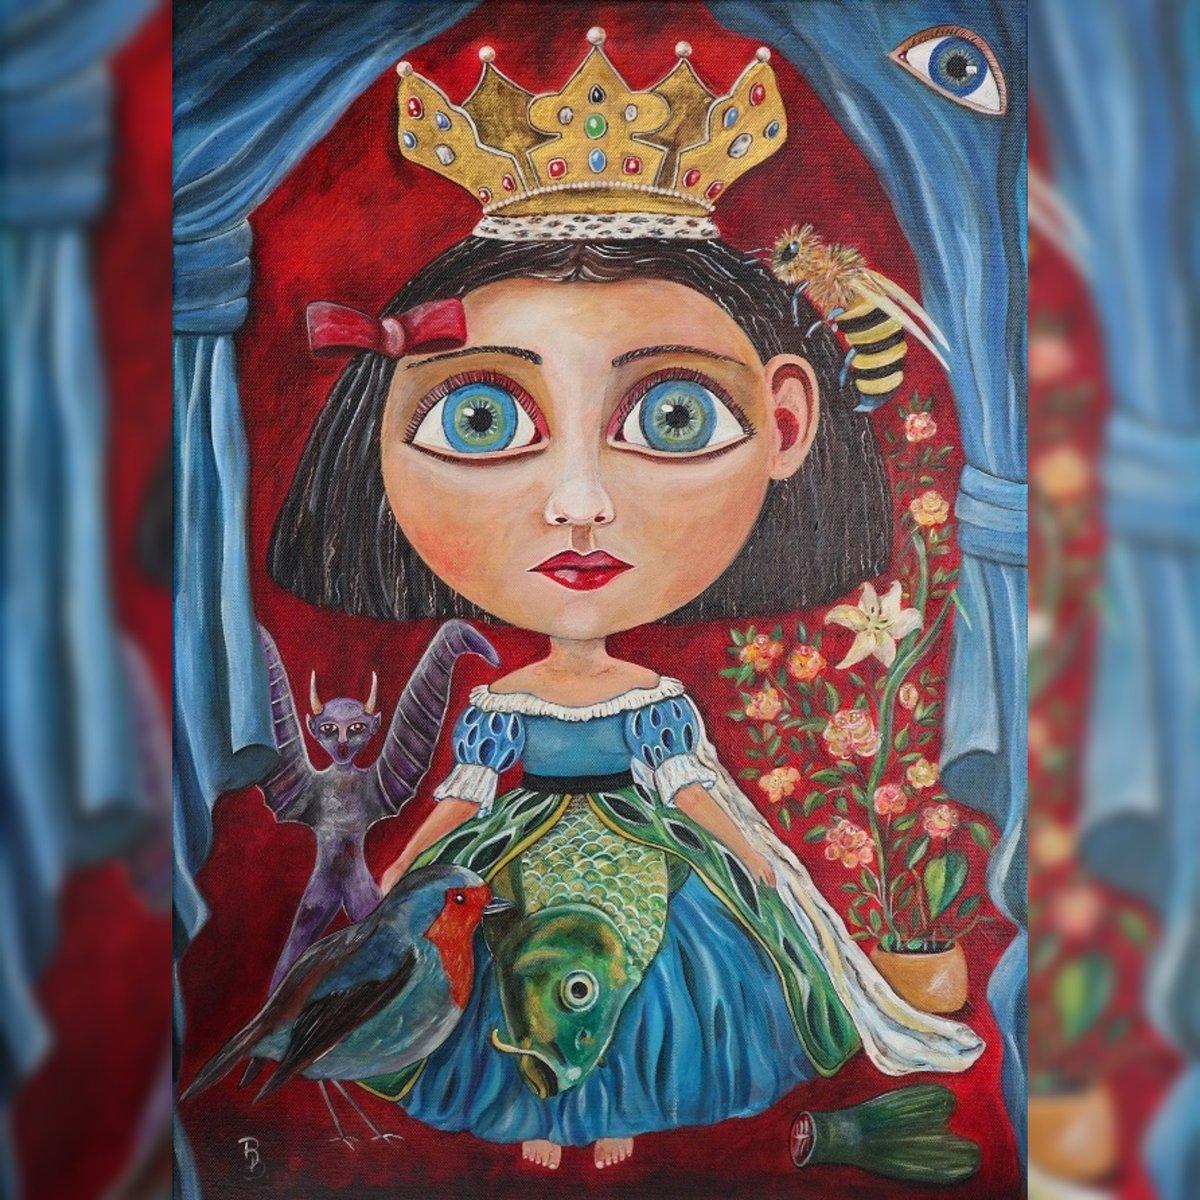 """Queen Big Head"" . . #QueenBigHead #Painting #Surrealism #Acrylic #Canvas #BarbaraJohannaBilleiter #Duckylemon #Painter #Artist #Germany #Bavaria #Franconia #Nuremberg #Fantasy #Instagram #Twitter #Queen #Fish #Robin #Bee #Demon #Eye #Curtain #Fishtail #Crown"